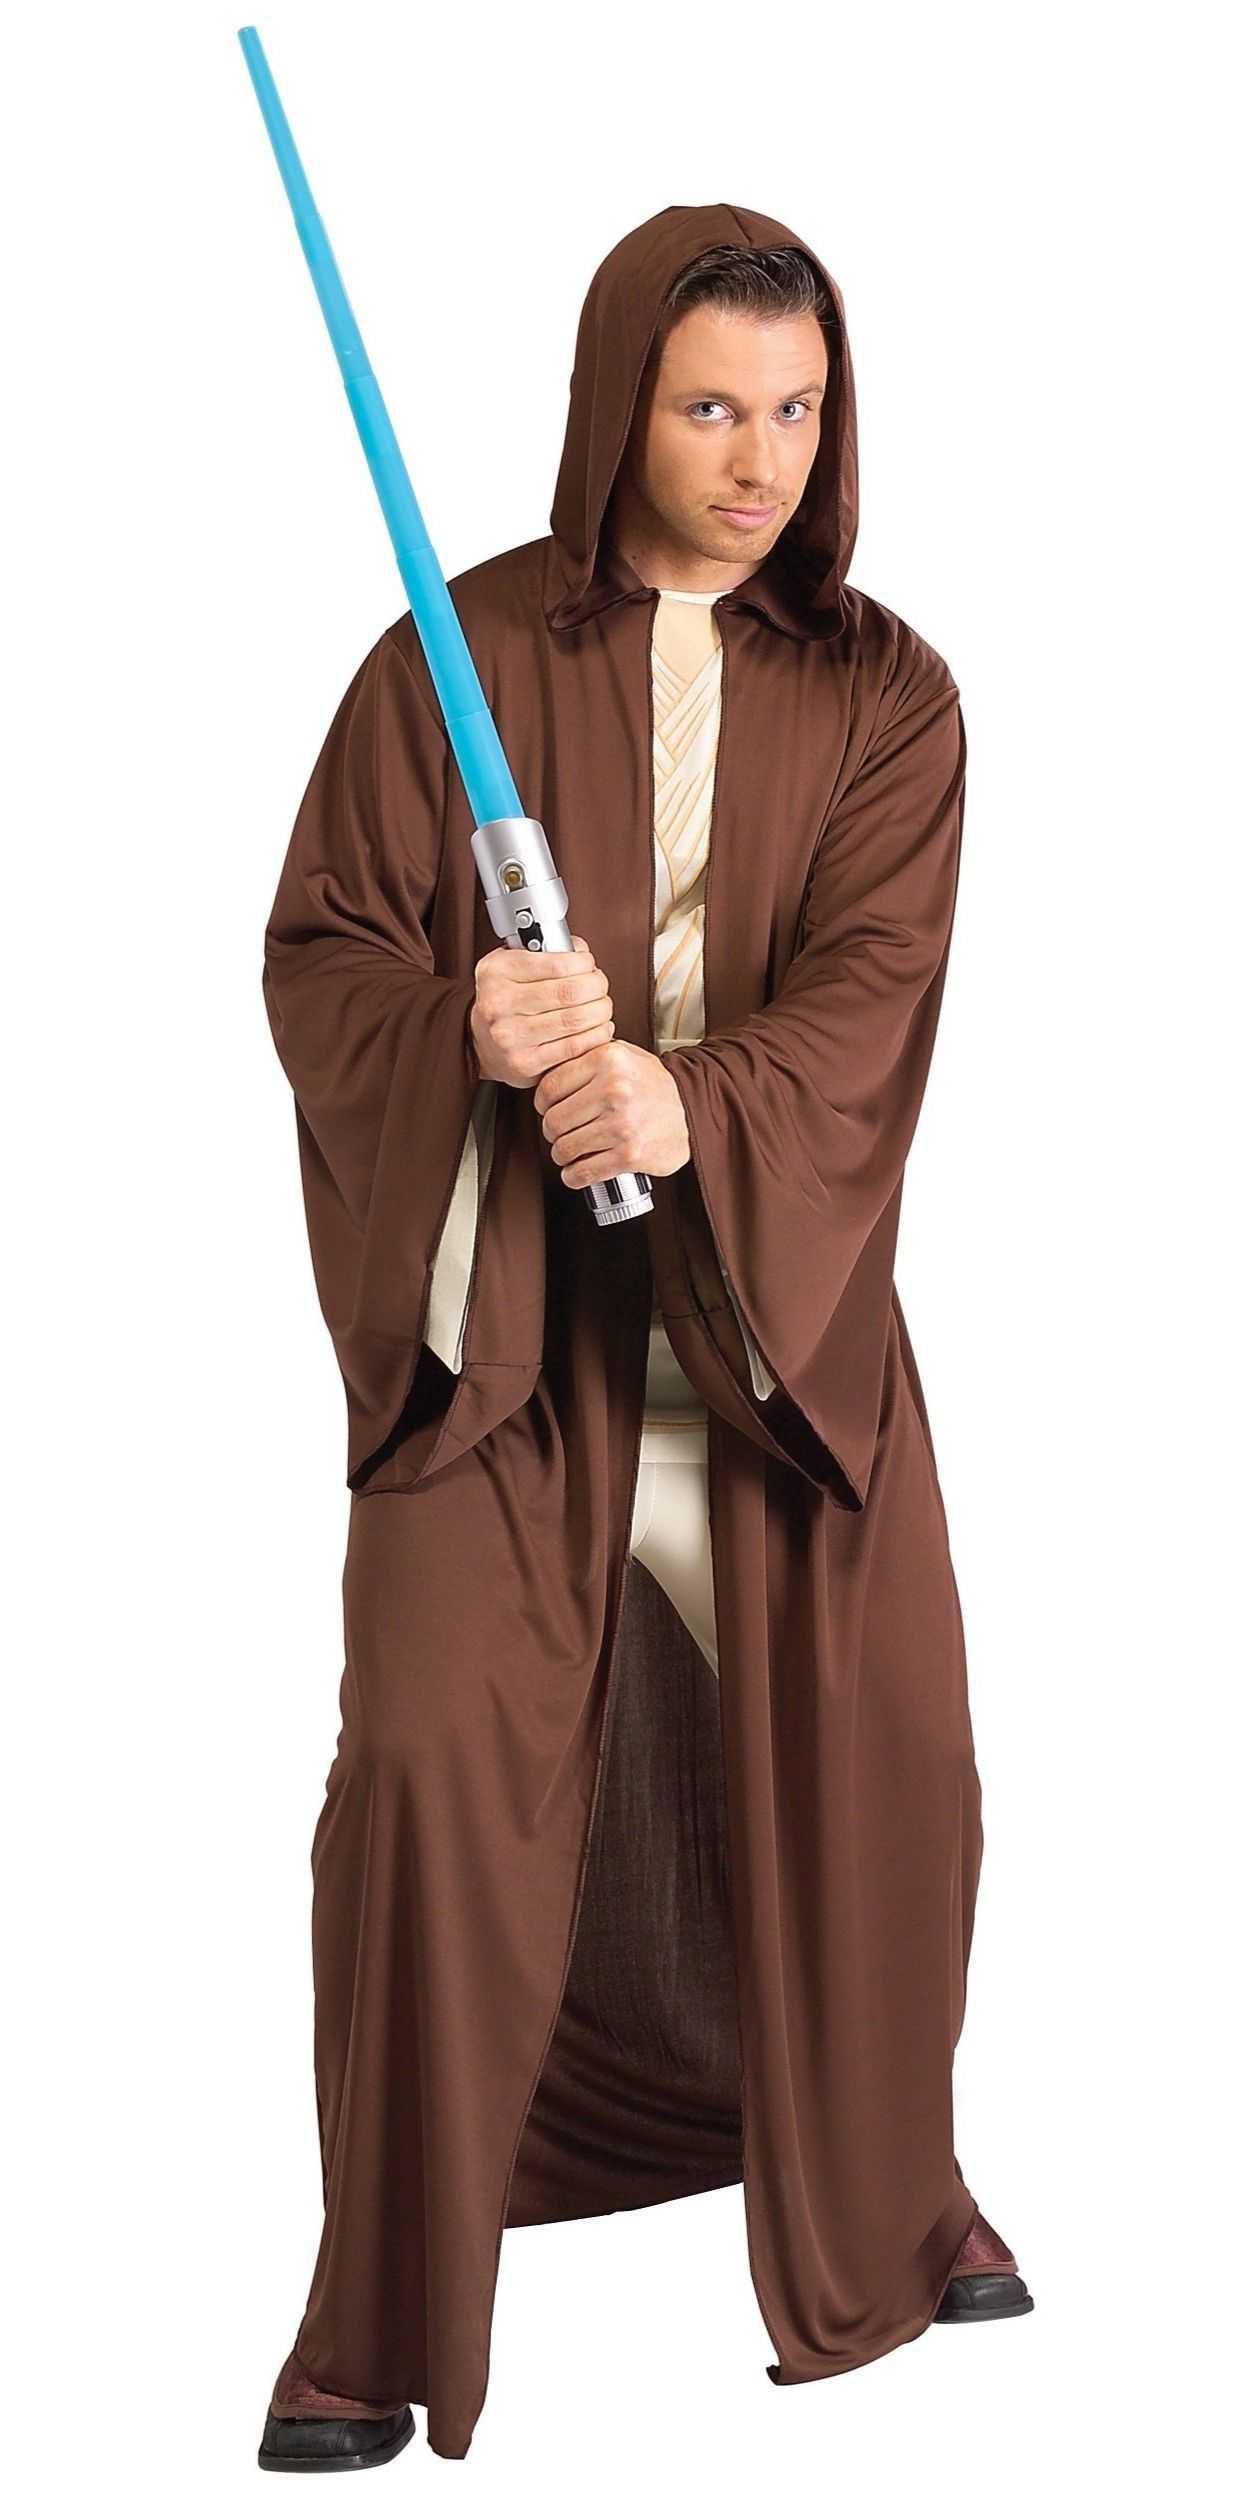 Man in Jedi Knight Party Costume